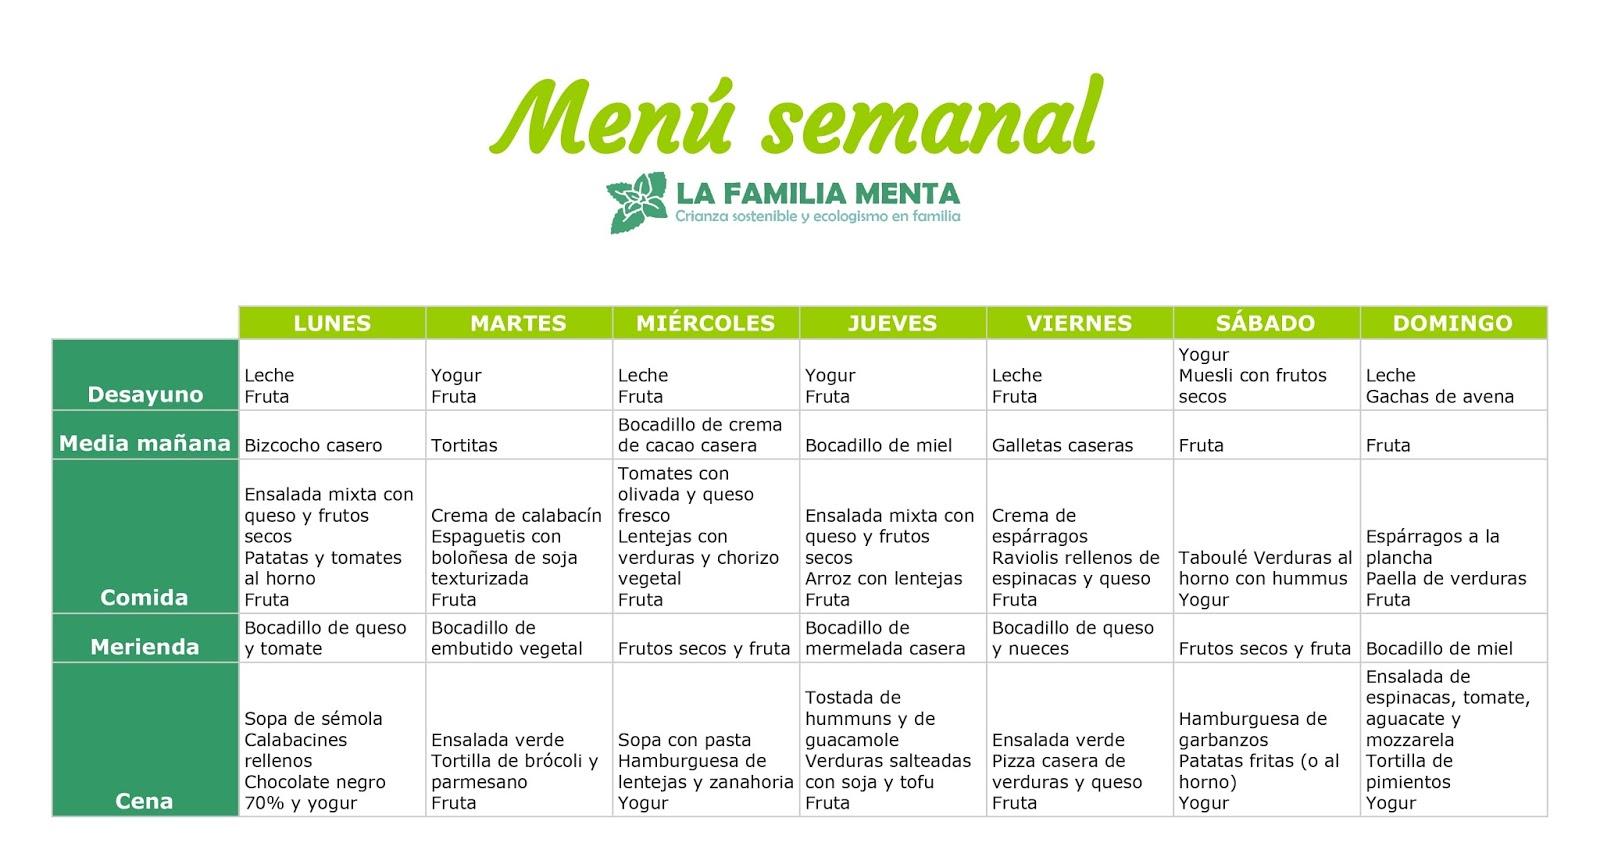 Menu Semanal Dieta Mediterranea Para Toda La Familia Dieta Saludable Semanal Paraguay